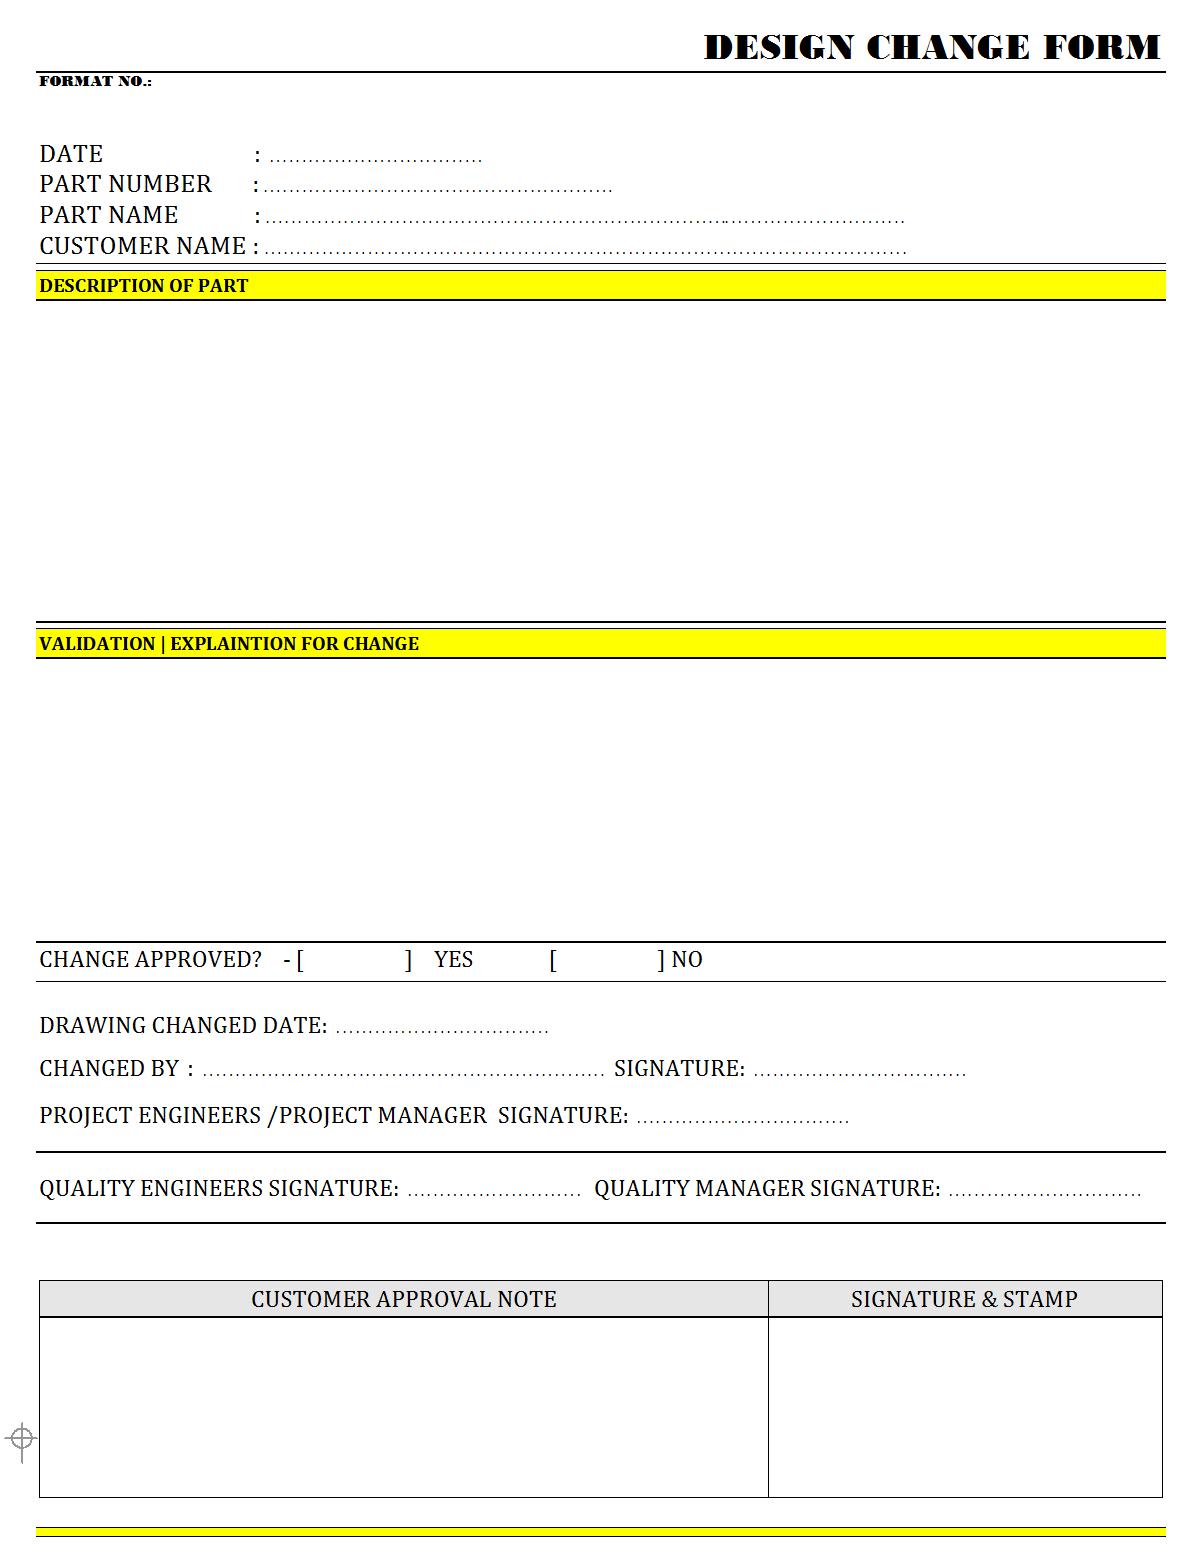 design approval form - Timiz.conceptzmusic.co